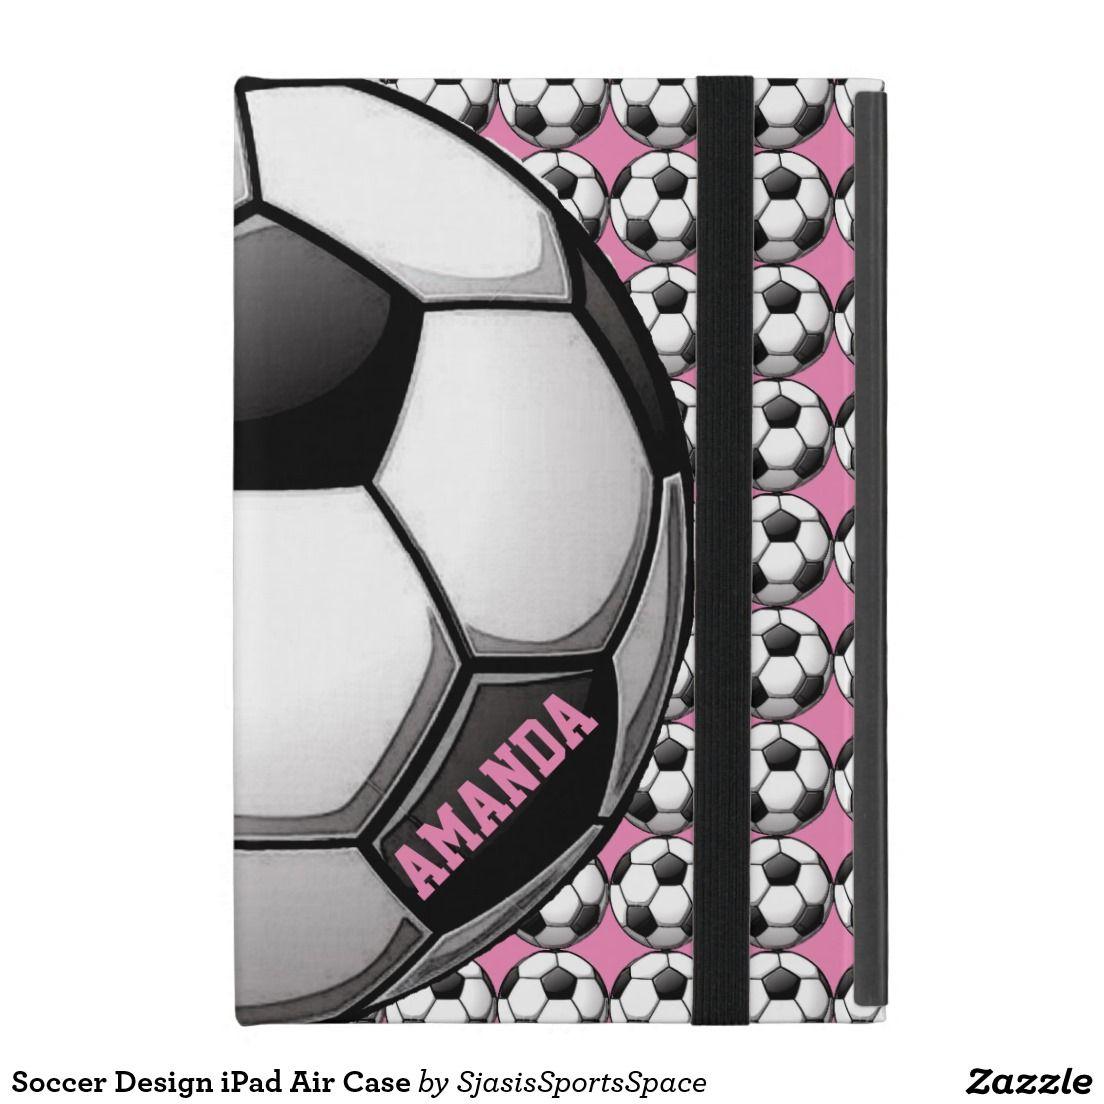 #Girly #Soccer Design iPad Air Case @sjasis